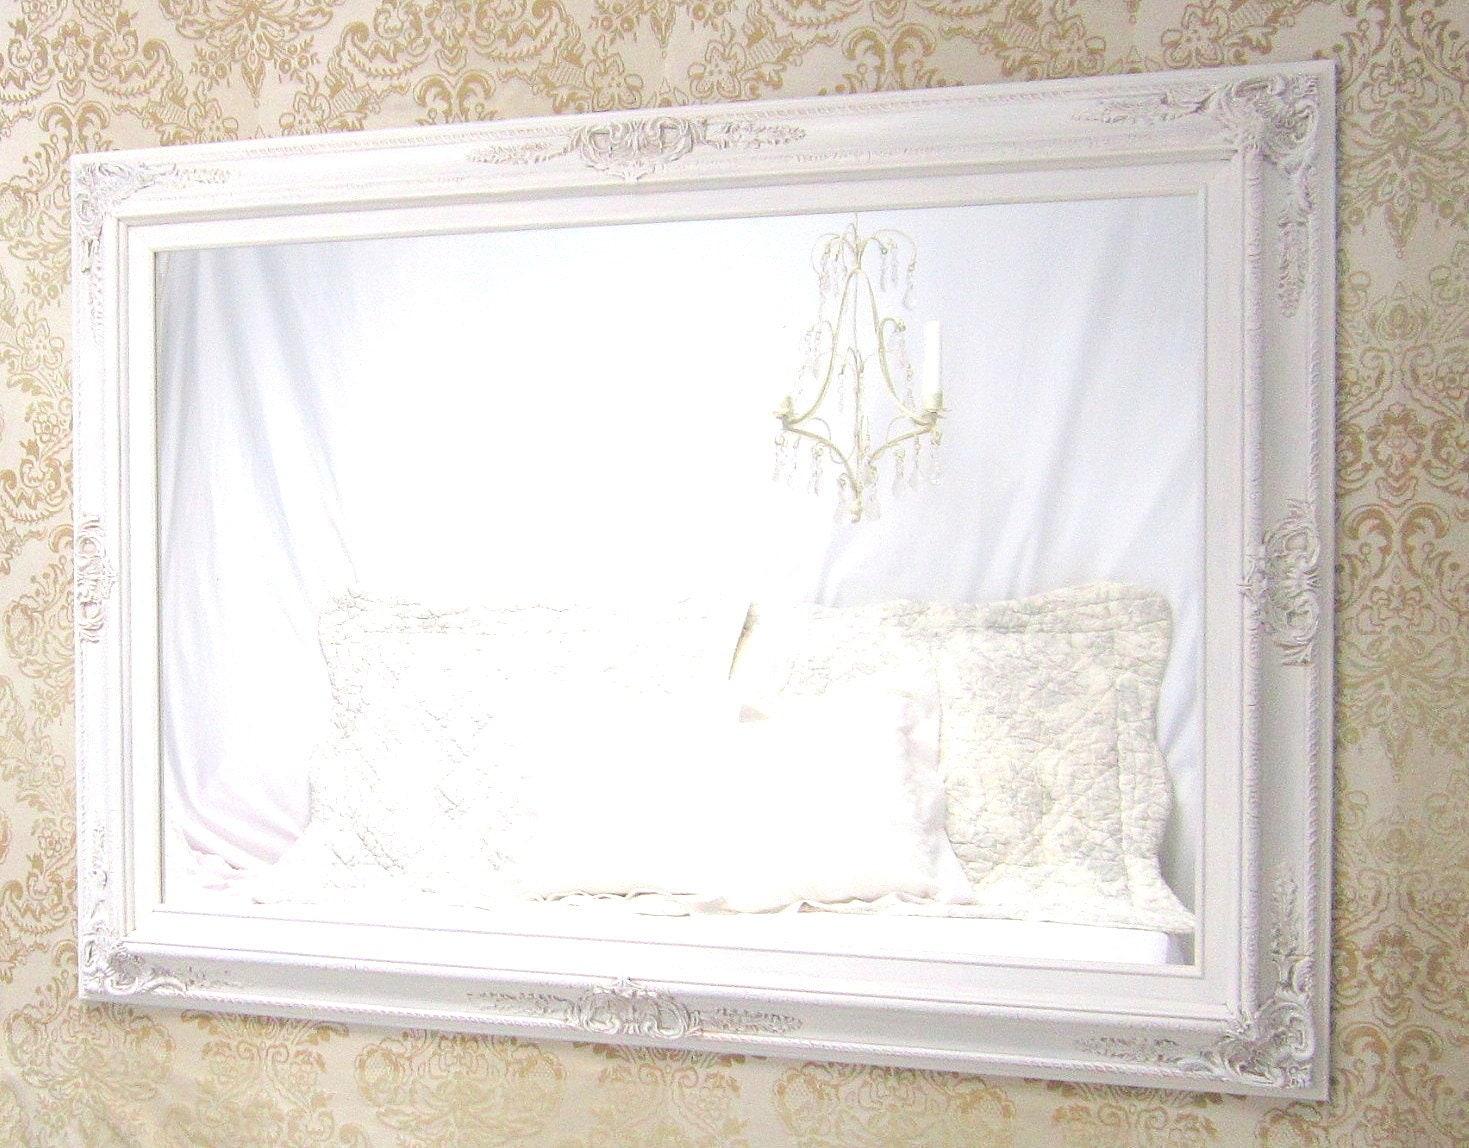 Decorative Vanity Mirrors Any Color Large Mirror Bathroom